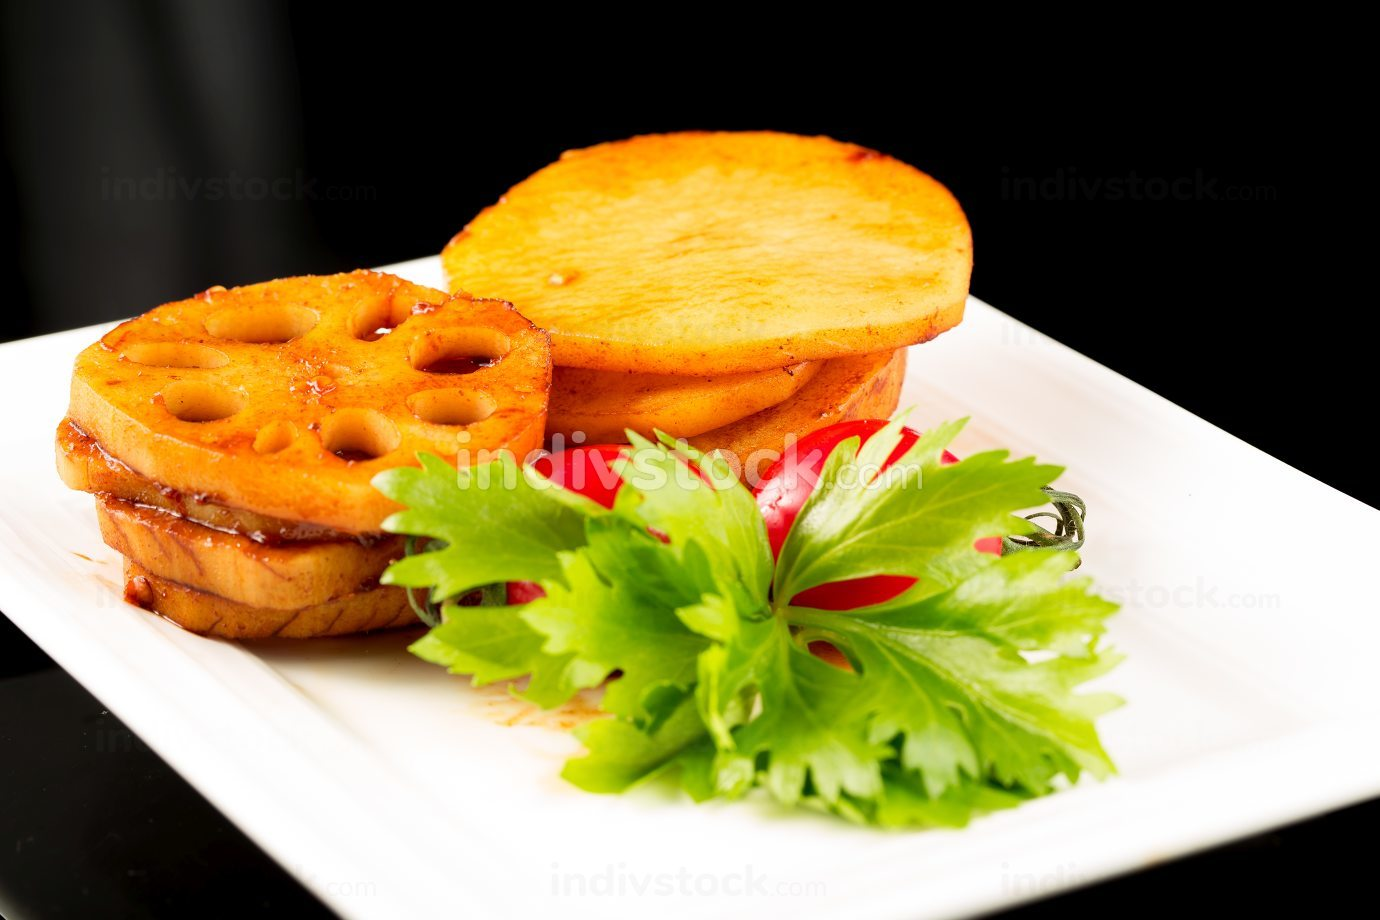 Braised lotus root and potatos, Chinese cuisine.